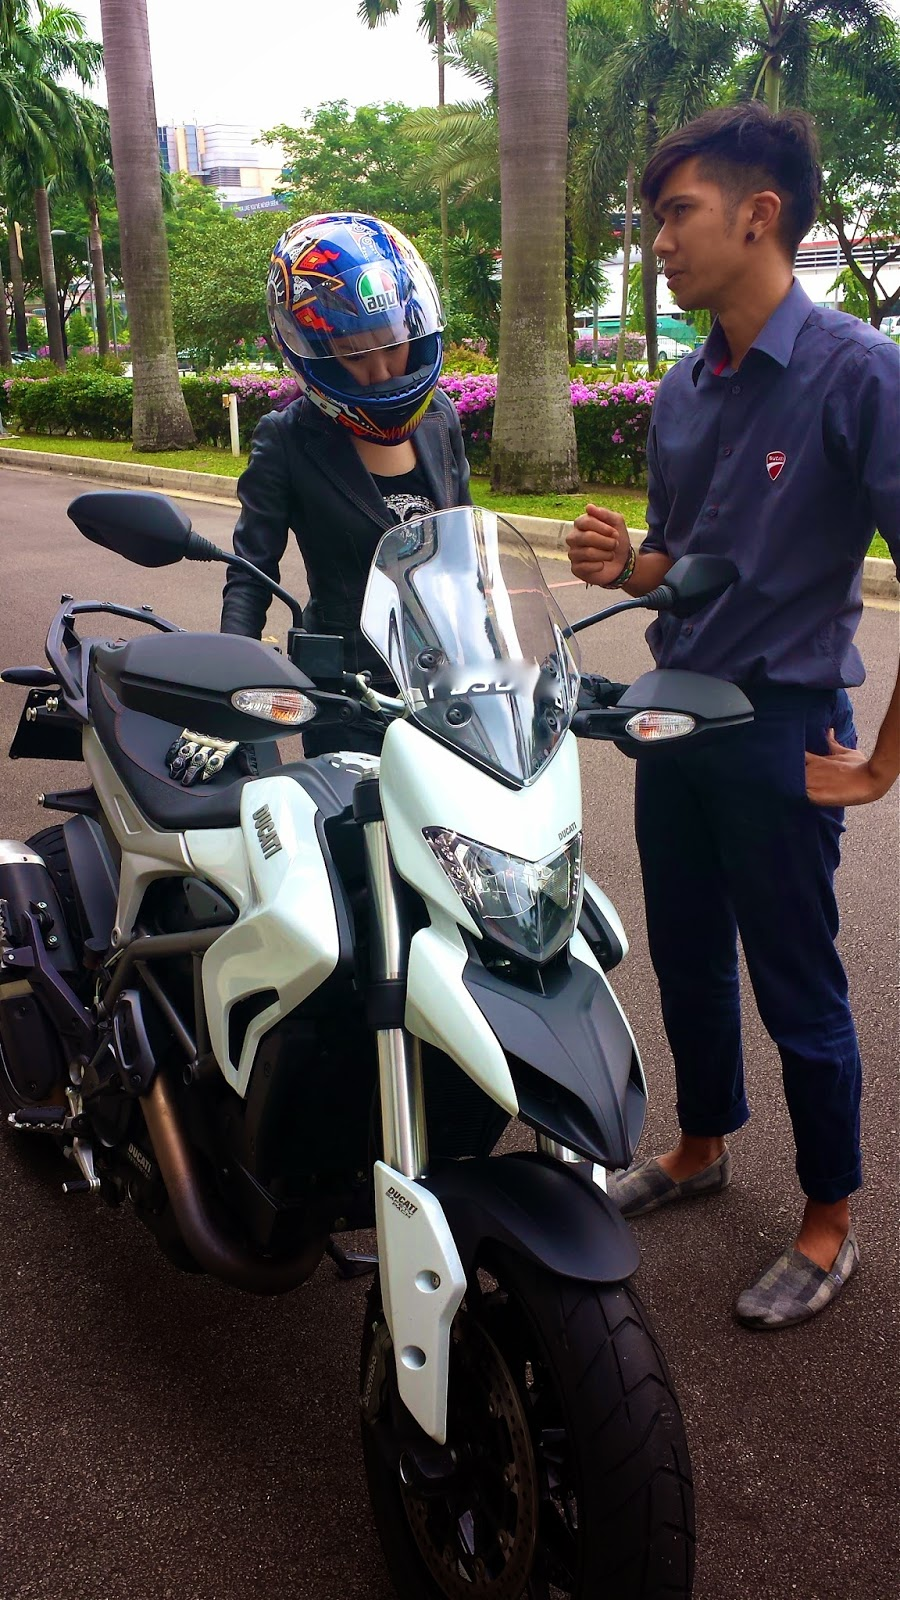 vaune phan: test ride special - ducati hyperstrada